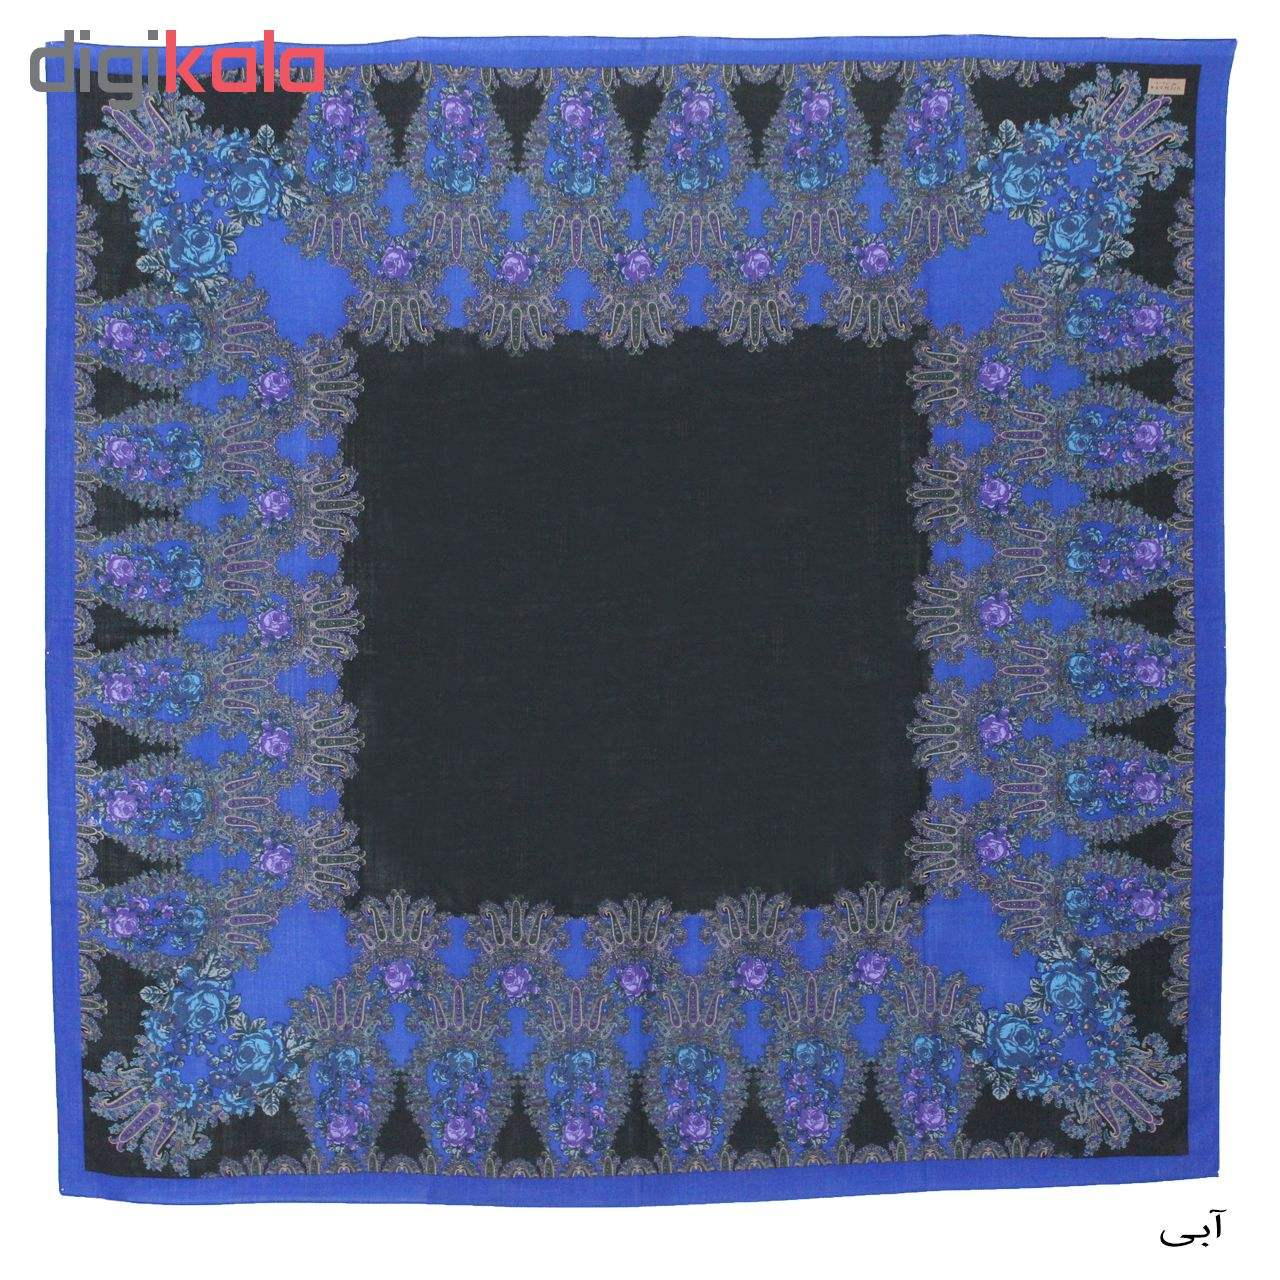 روسری زنانه برند ویسمارا مدل ملکه کد ۰۰۱۰ main 1 2